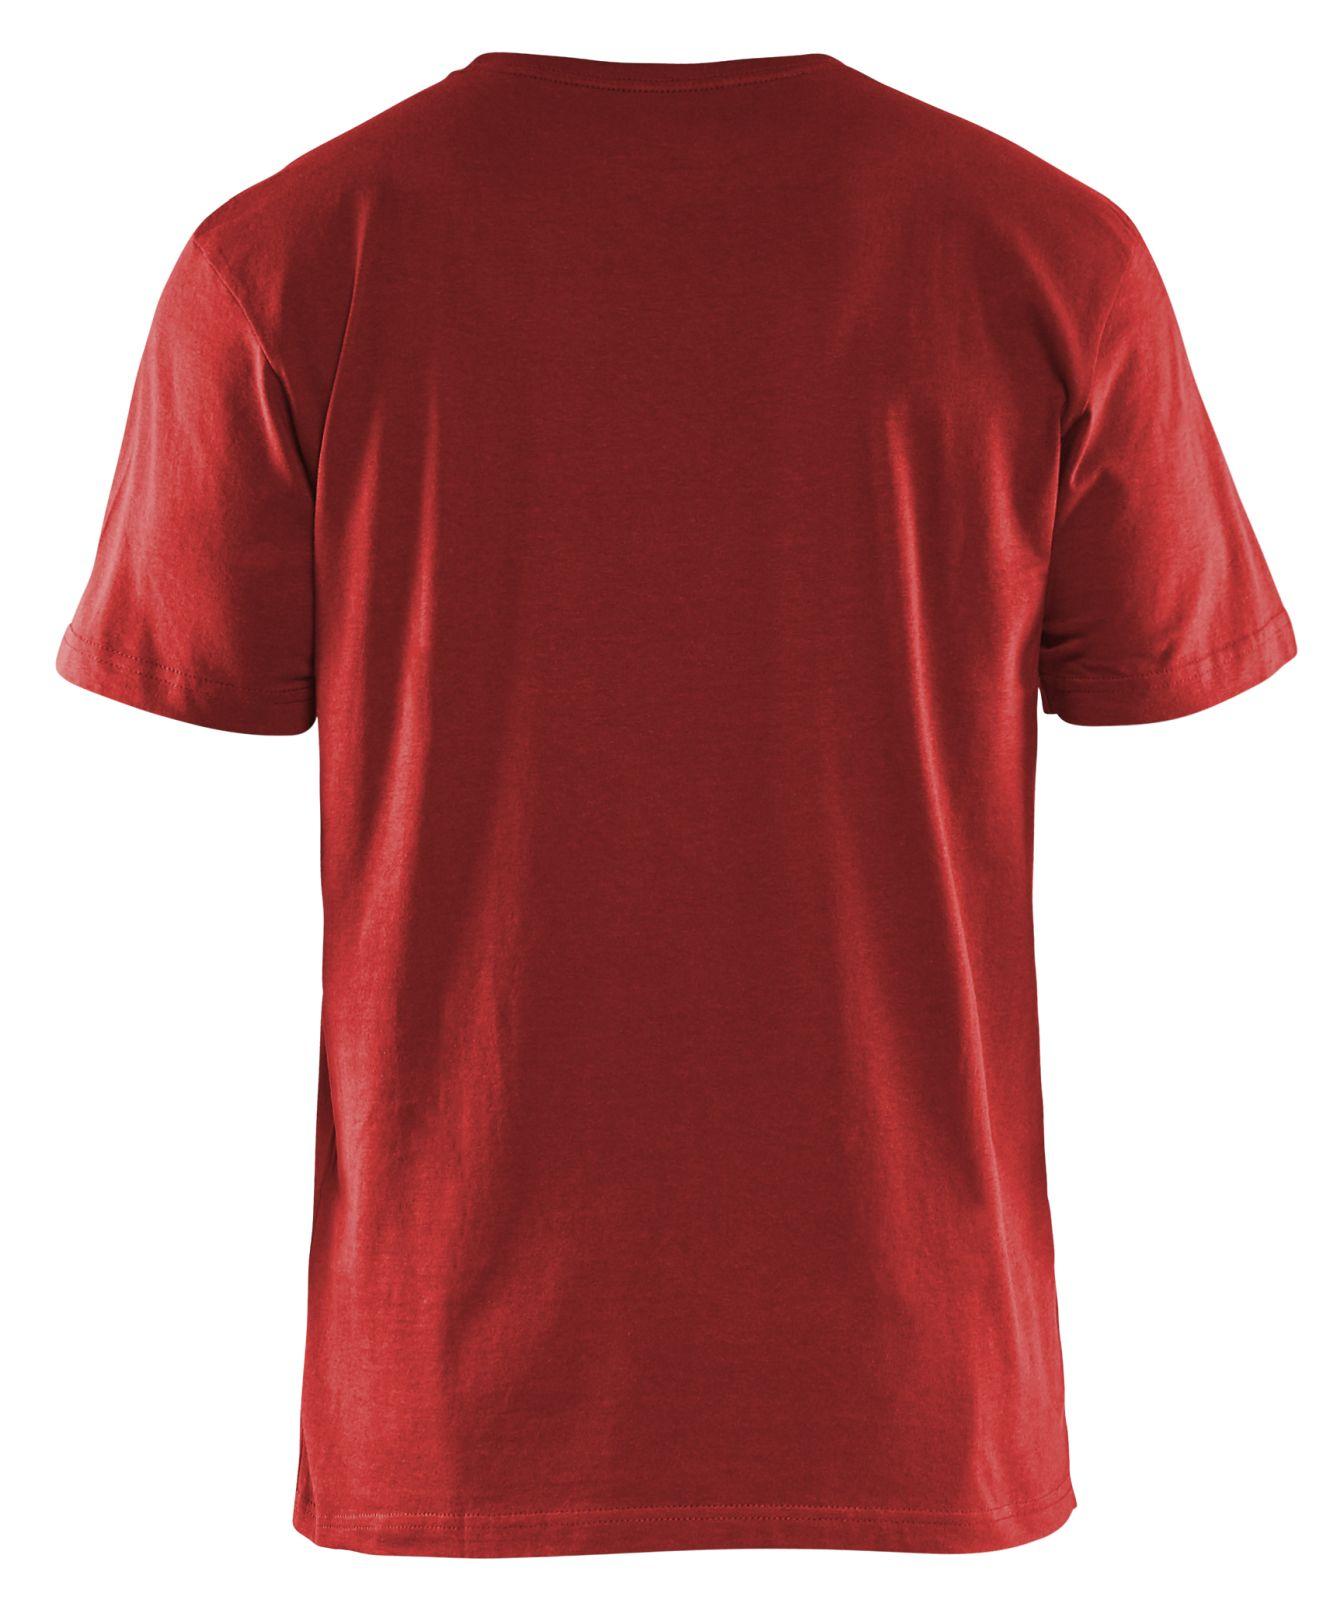 Blaklader T-shirts 33251042 5-pack rood(5600)